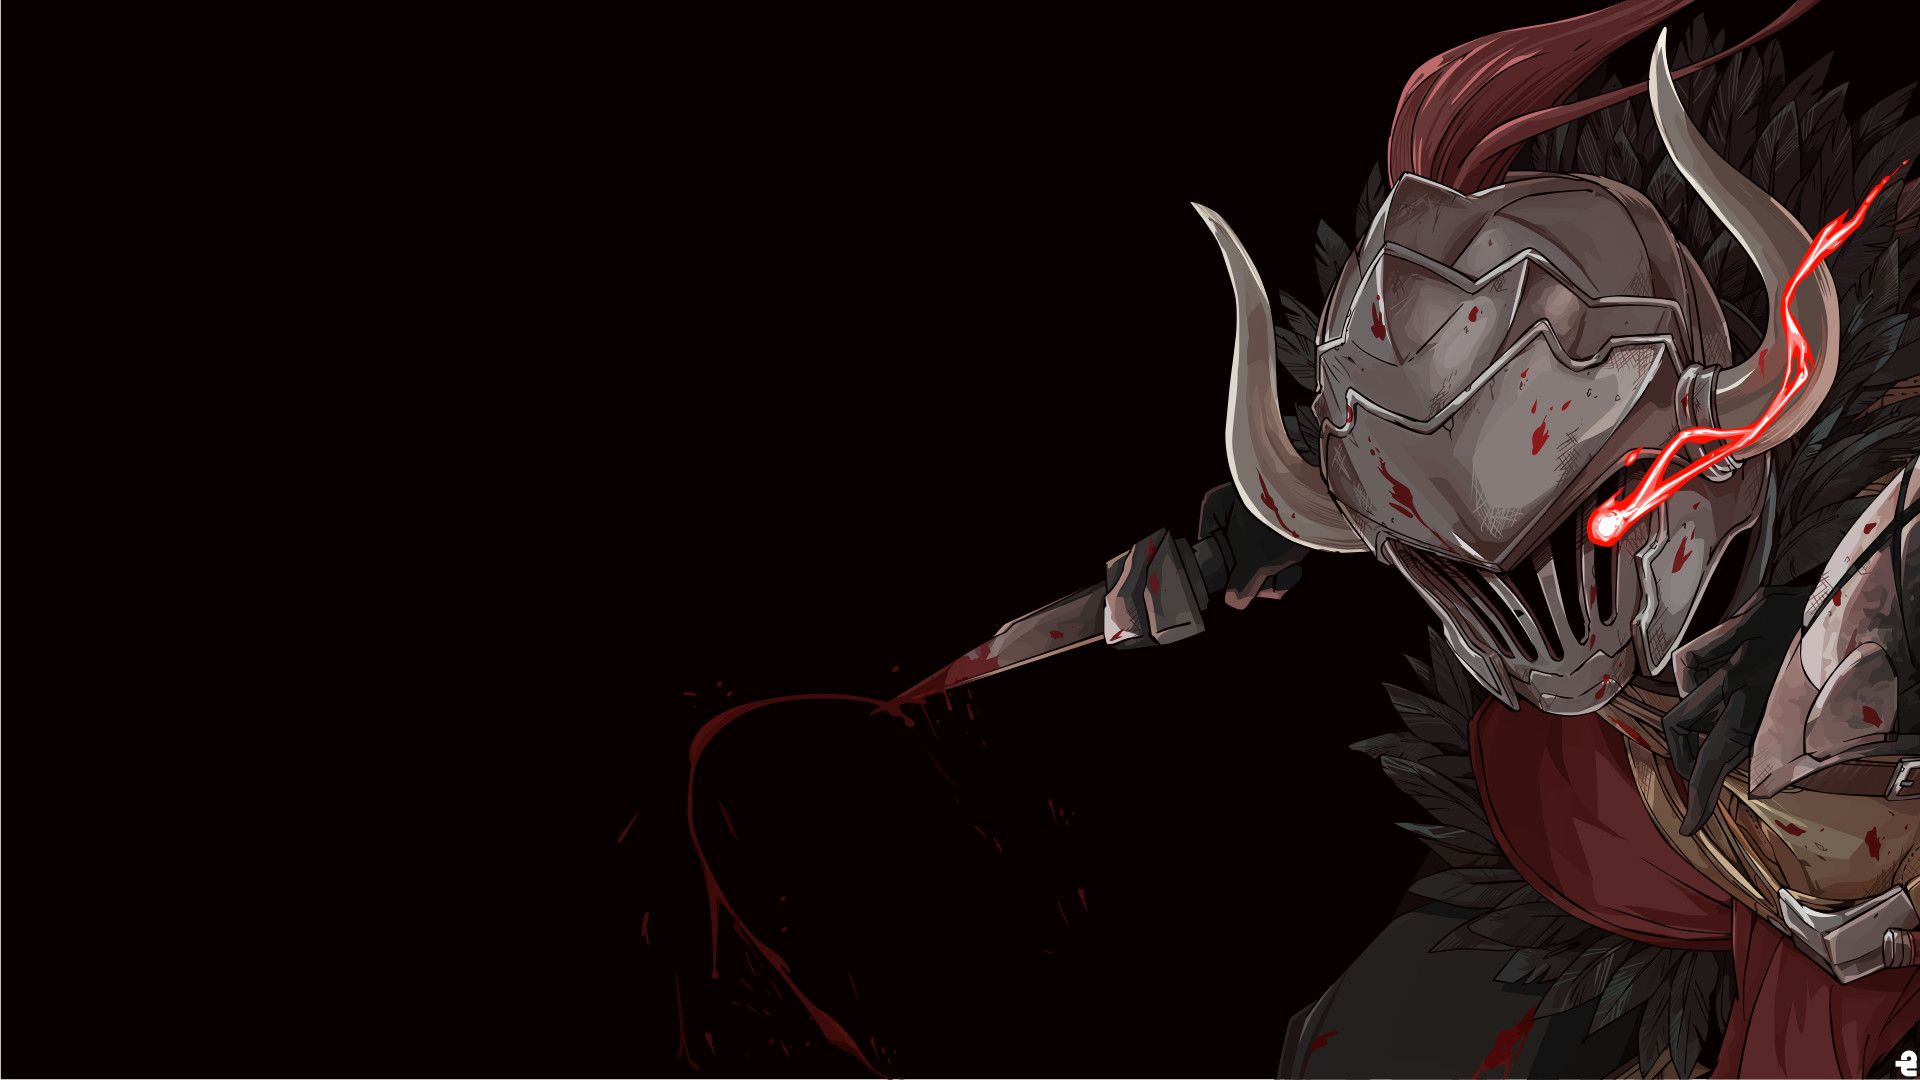 Demon Slayer 4k Wallpapers - Top Free Demon Slayer 4k ...